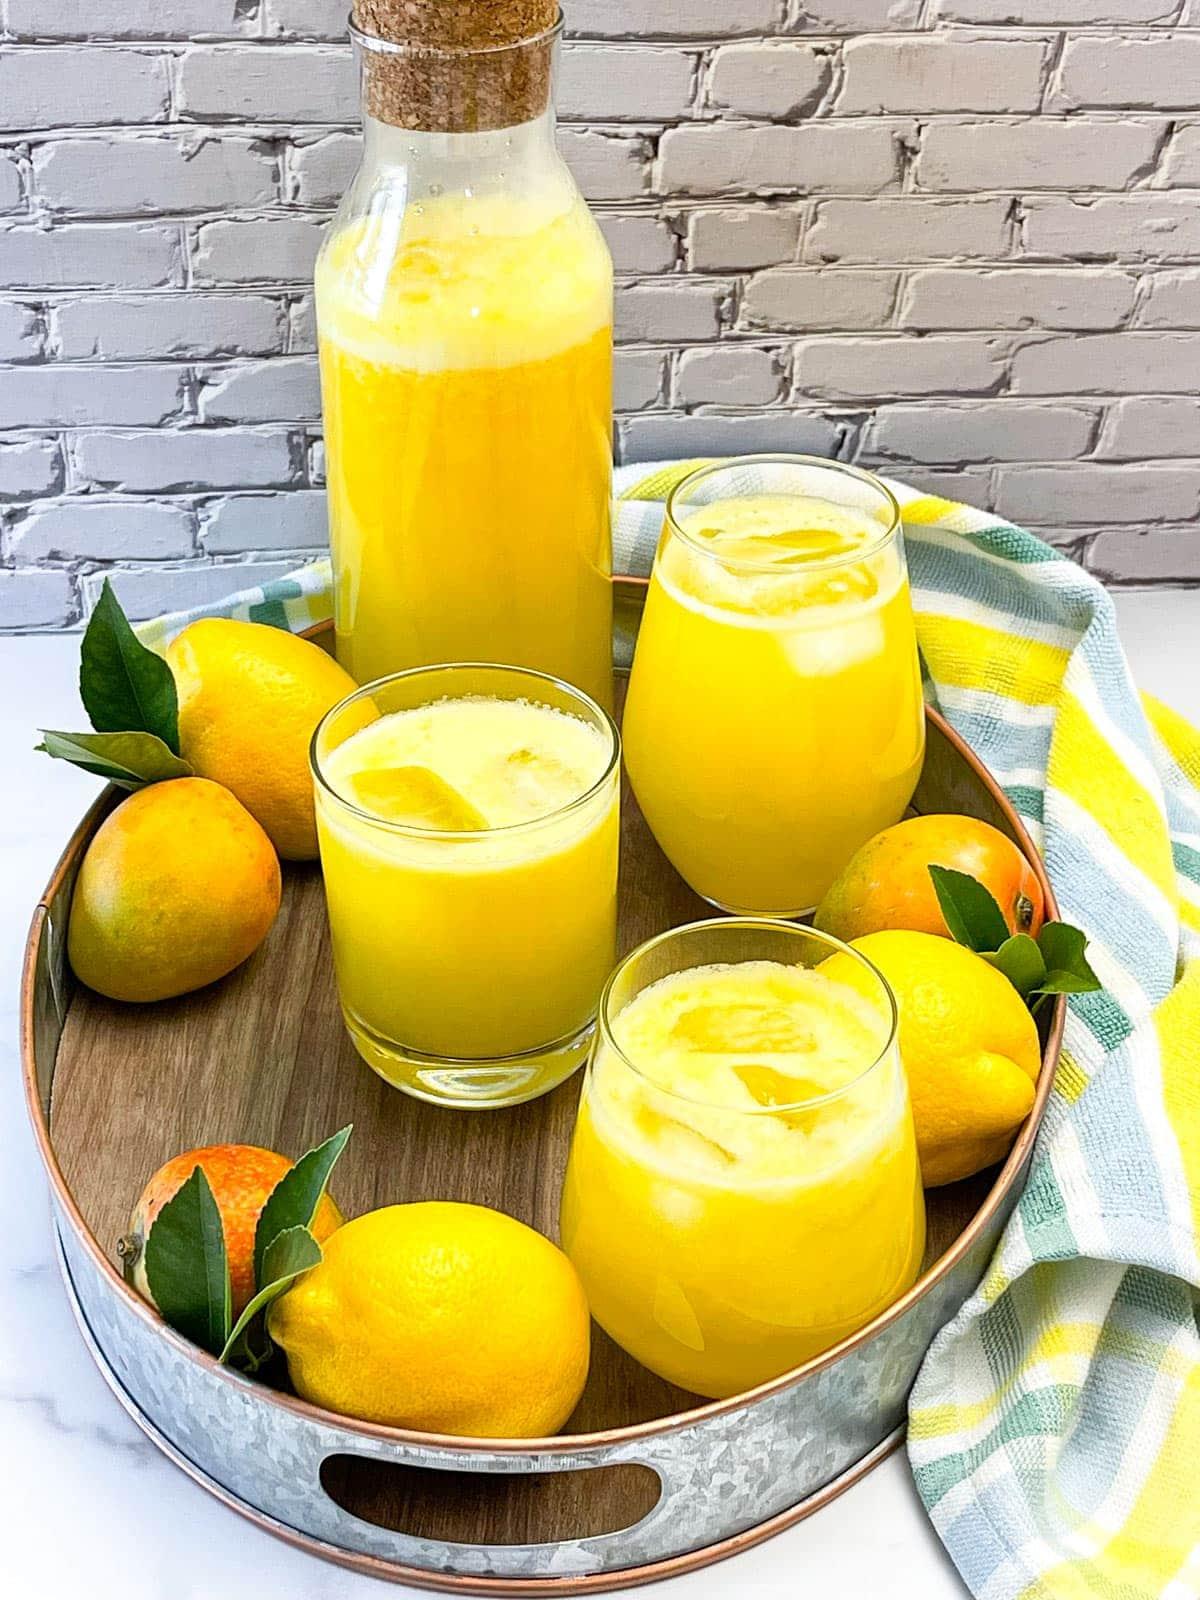 Mango lemonade overlay